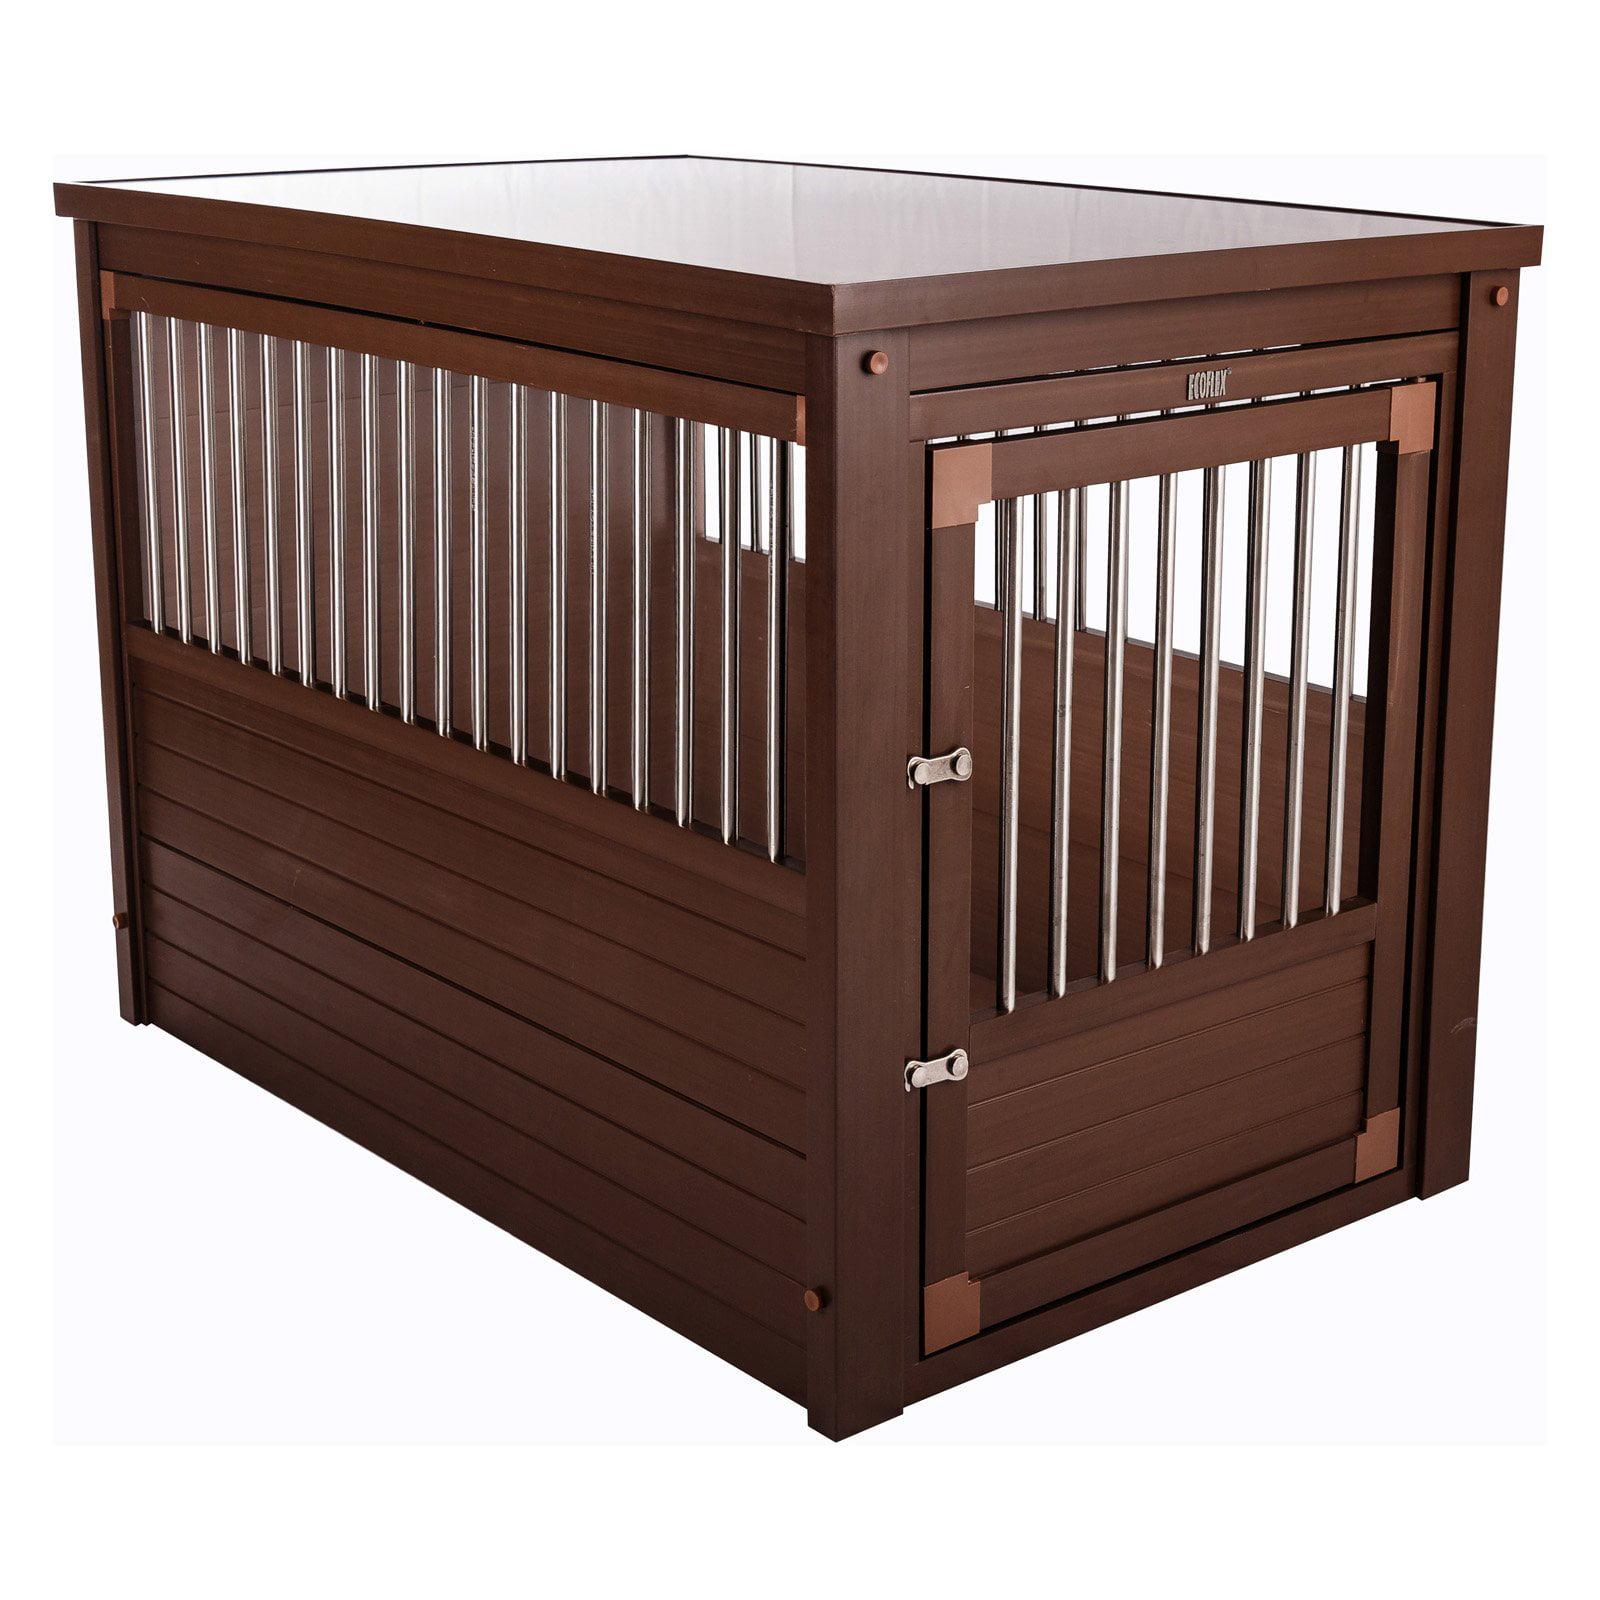 New Age Pet EcoFlex Habitat-n-Home InnPlace Pet Crate/Table - Russet